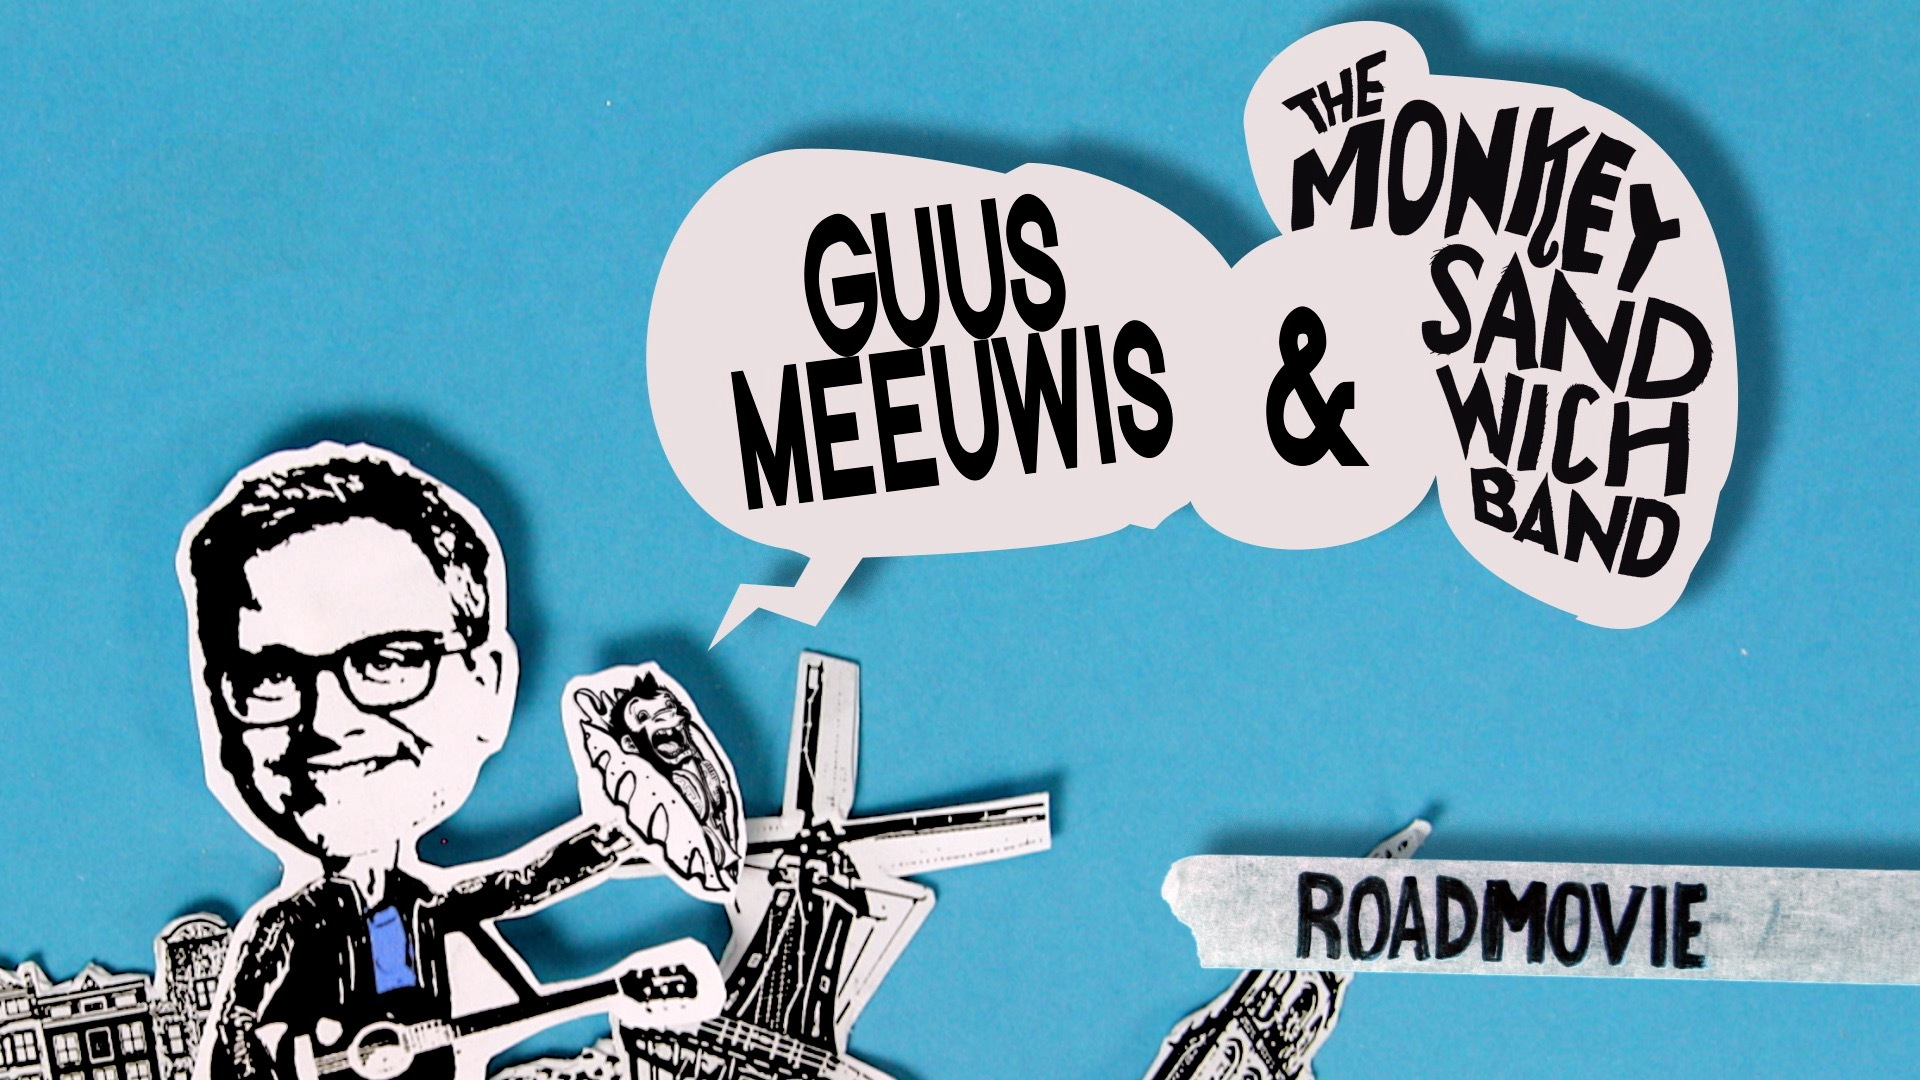 Leader/bumper - GuusMeeuwis en The Monkey Sandwich Band Clubtour-